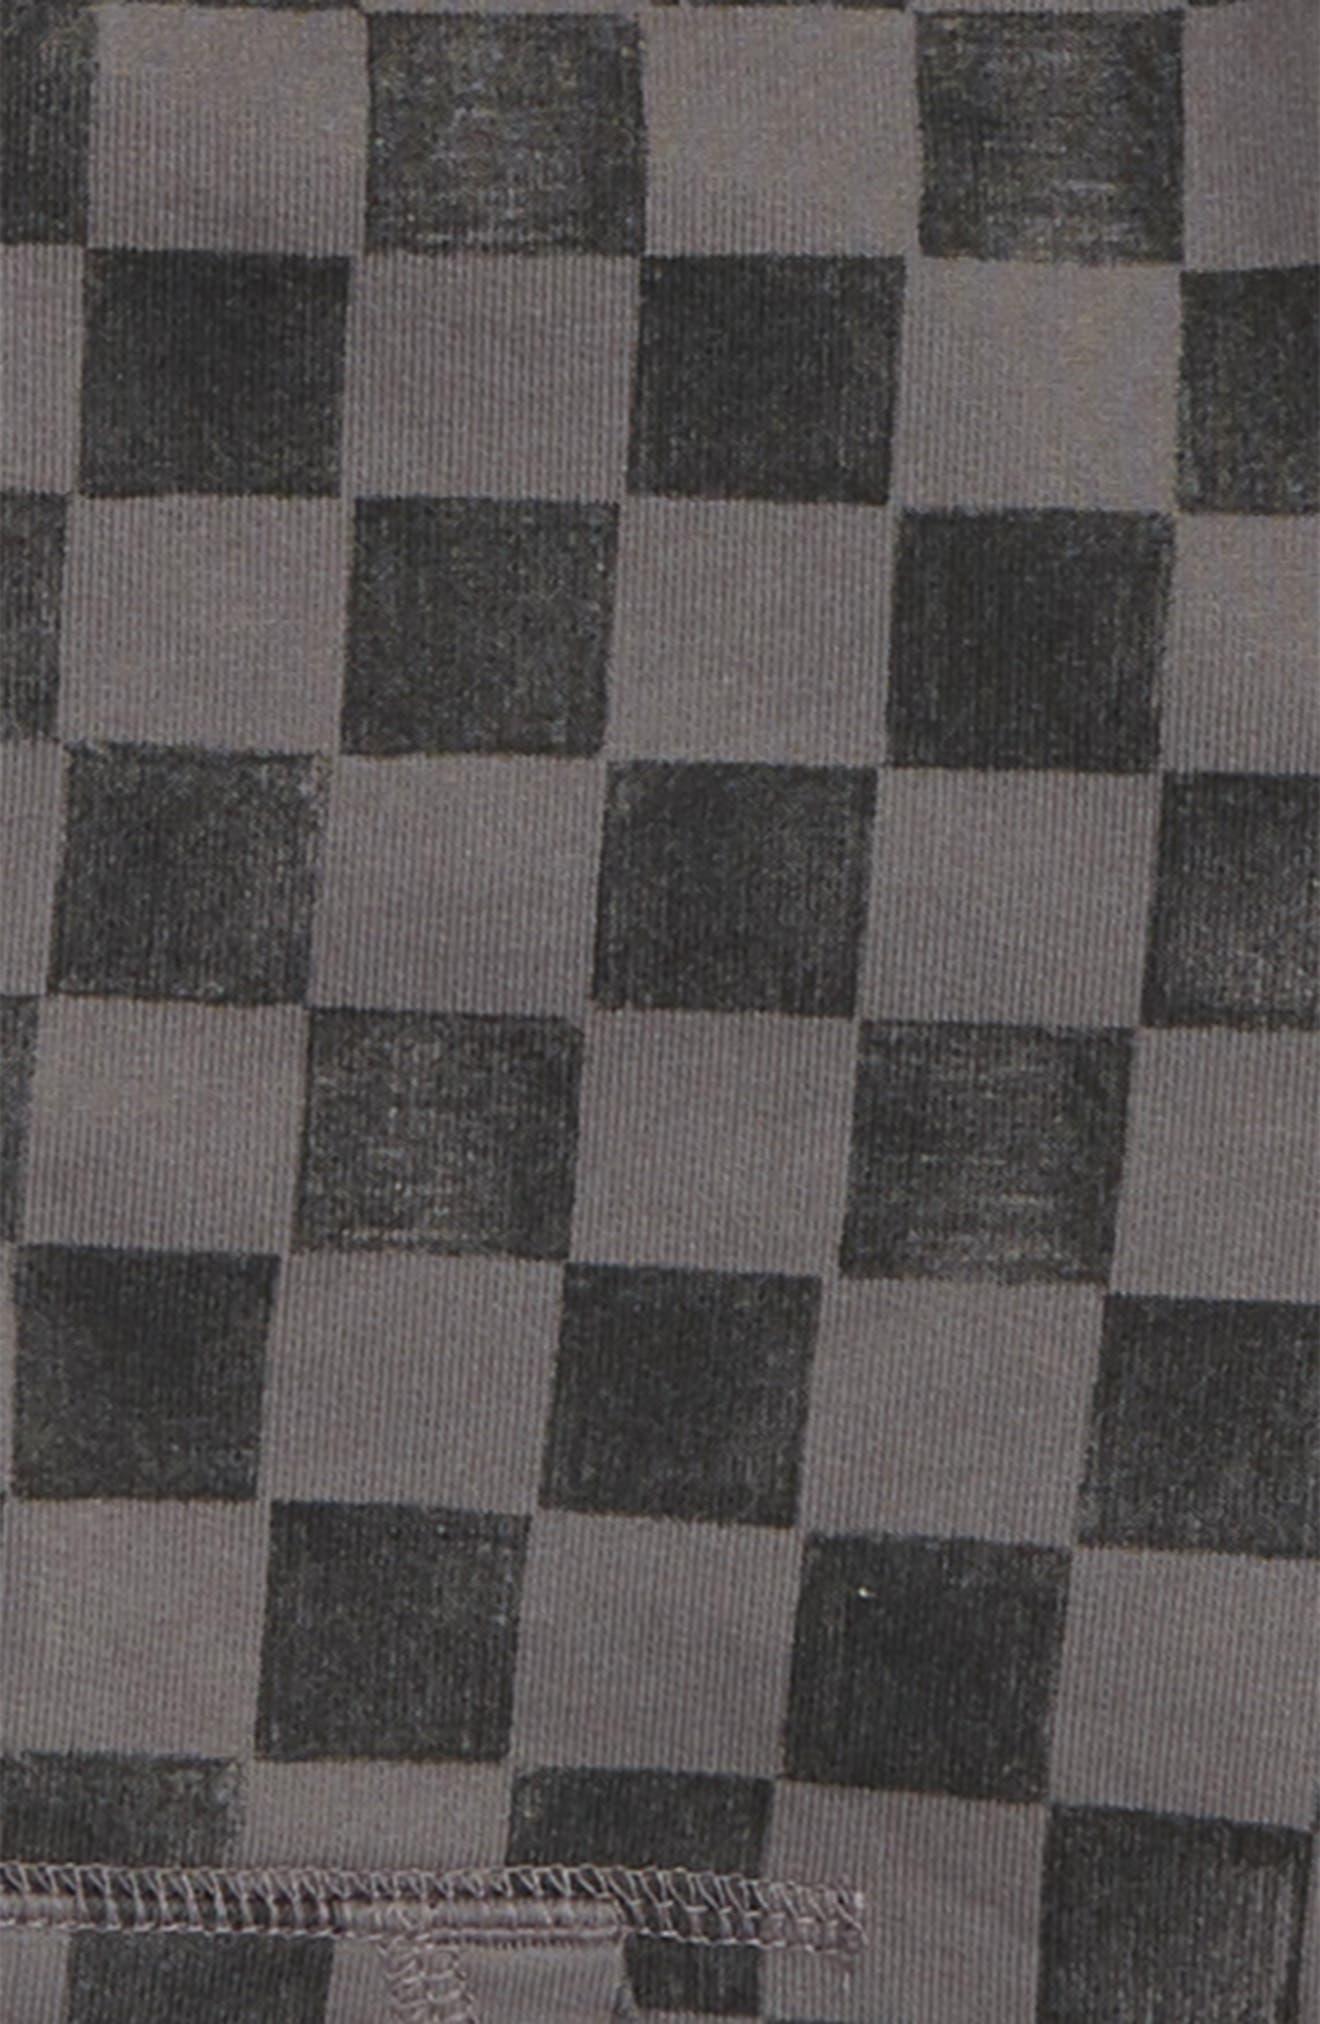 Checkerboard Zip Hoodie,                             Alternate thumbnail 2, color,                             Soho Squares